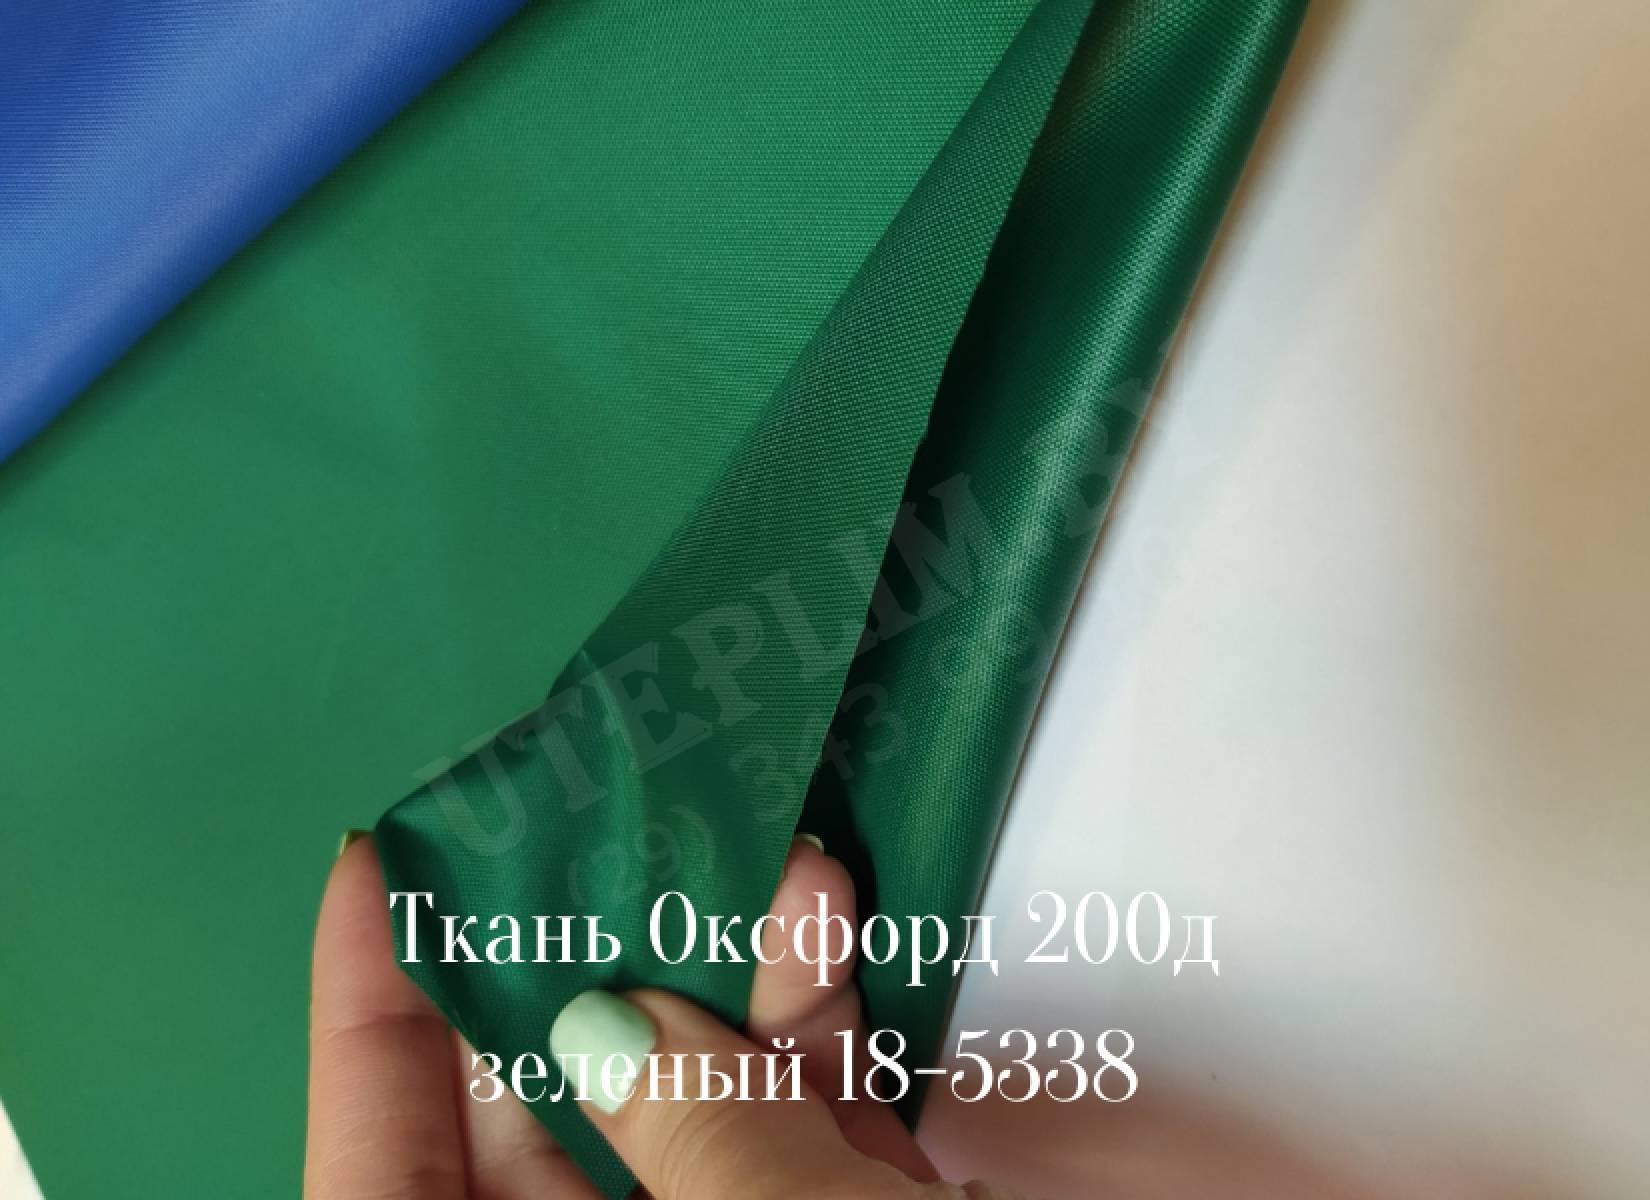 зеленый 18-5338